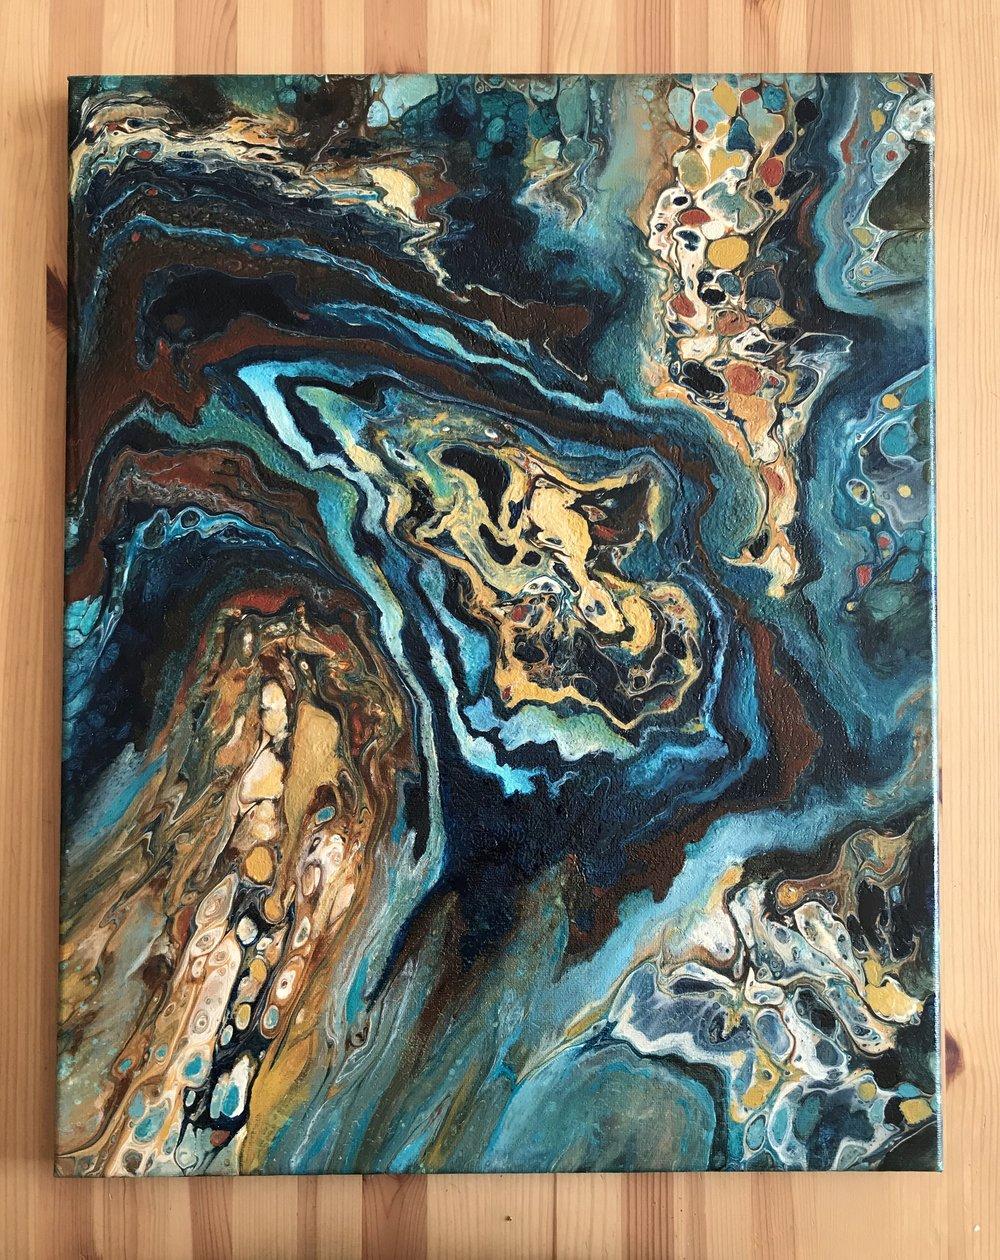 "Untitled • Oil + acrylic on canvas ∙ 20x16"" ∙ 2018"